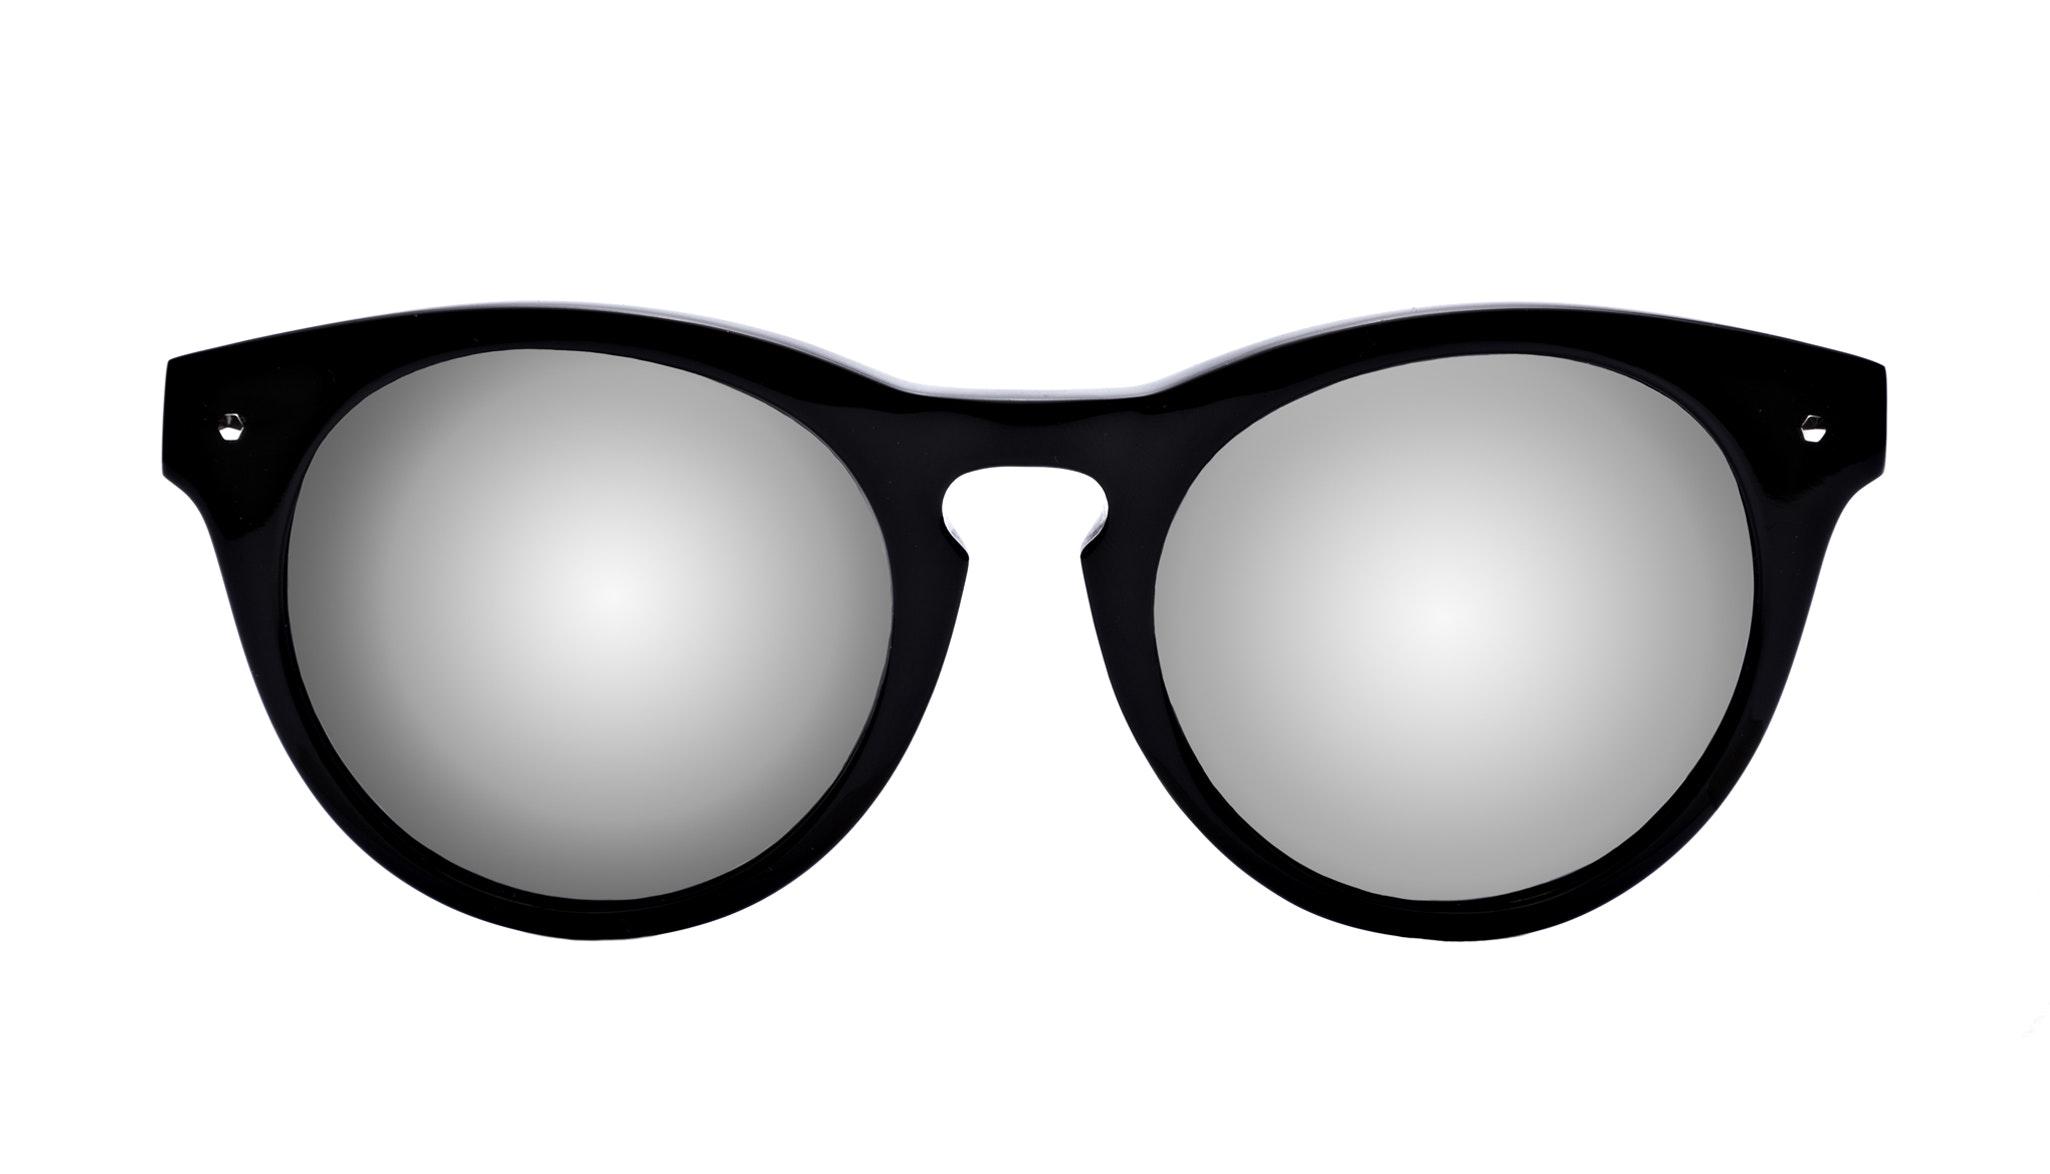 all black aviator sunglasses hewg  Affordable Fashion Glasses Cat Eye Round Sunglasses Women Nola Pitch Black